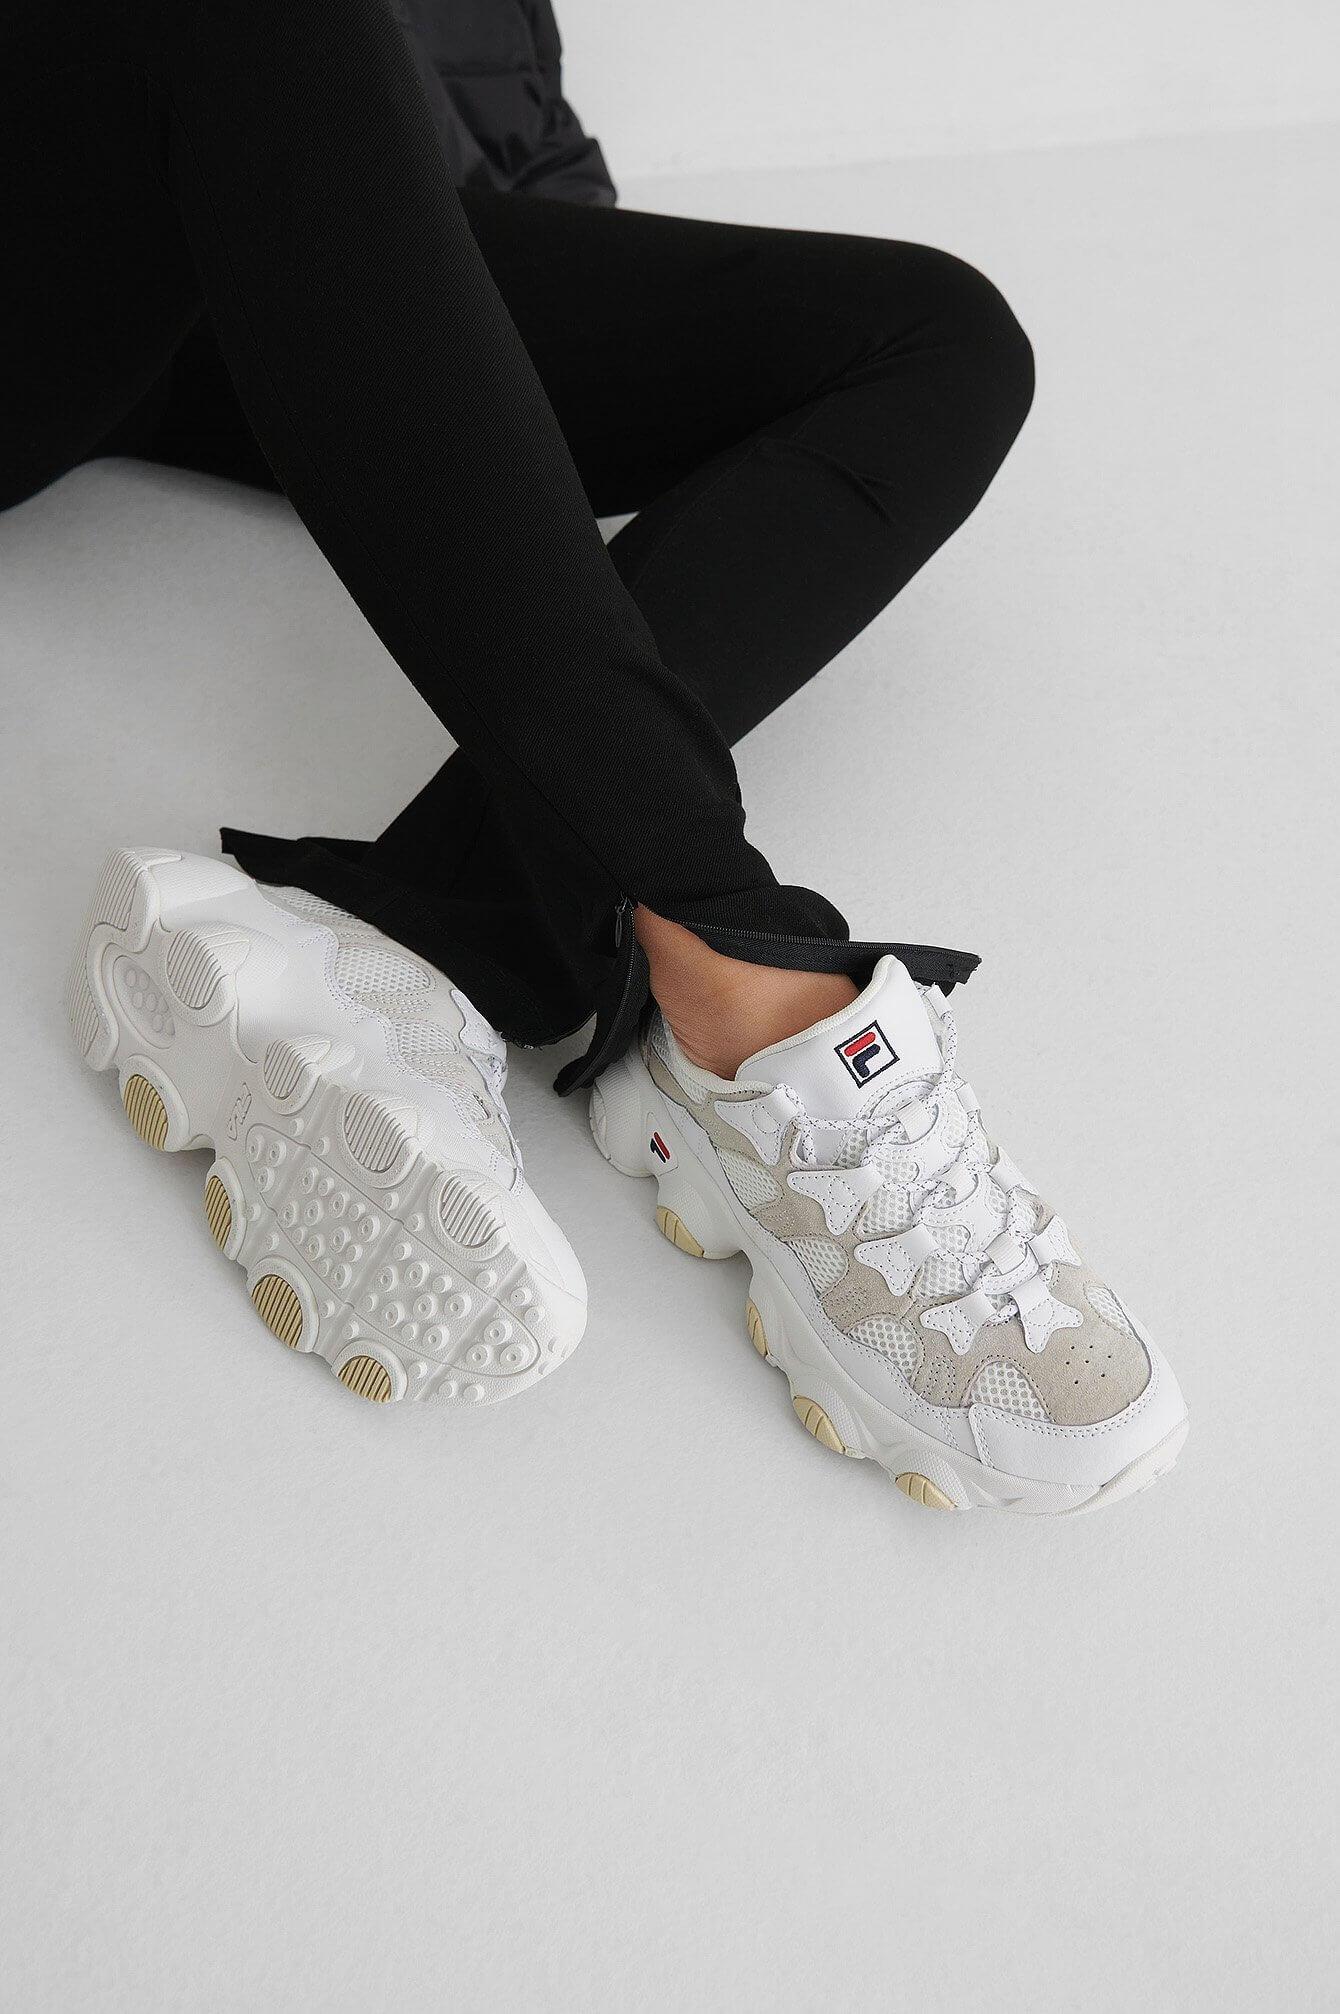 Trendiga, vita sneakers från Fila.